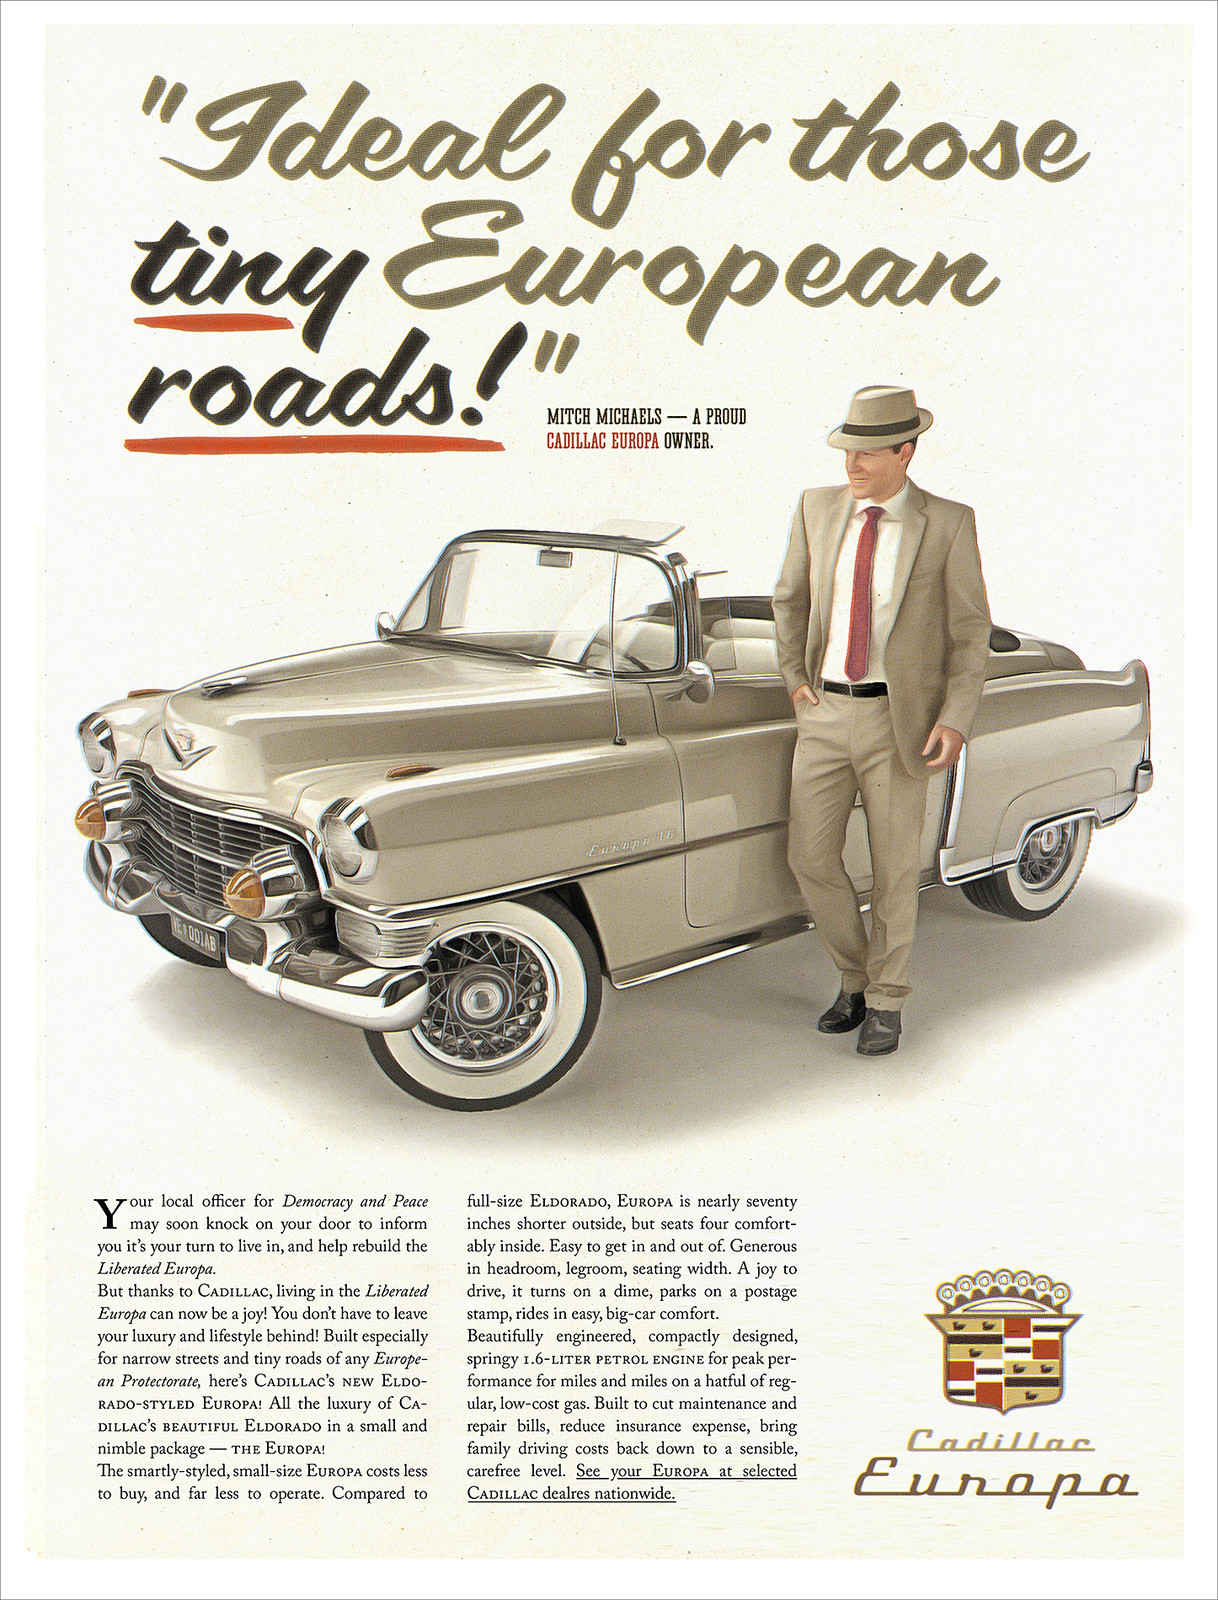 Cadillac Europa ad.